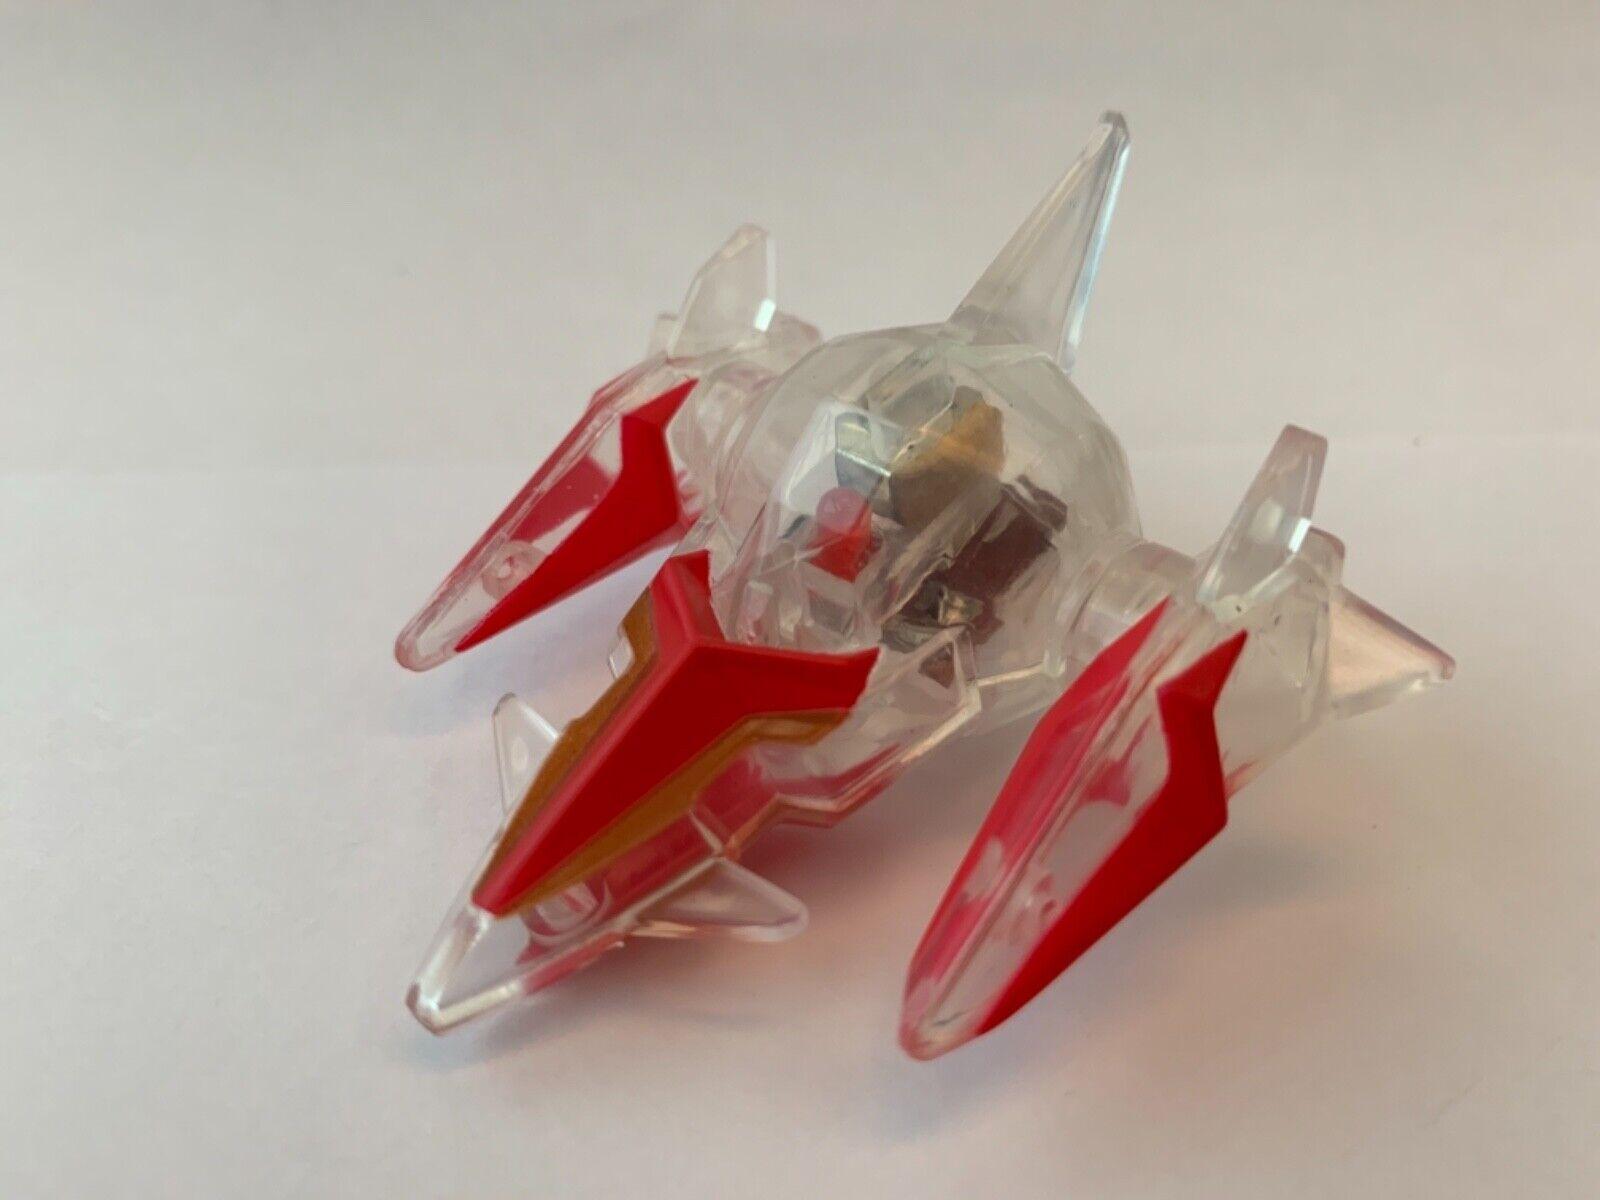 Rare Bandai chromium Chester set Ultraman Nexus machine series Plane Set of 4pcs